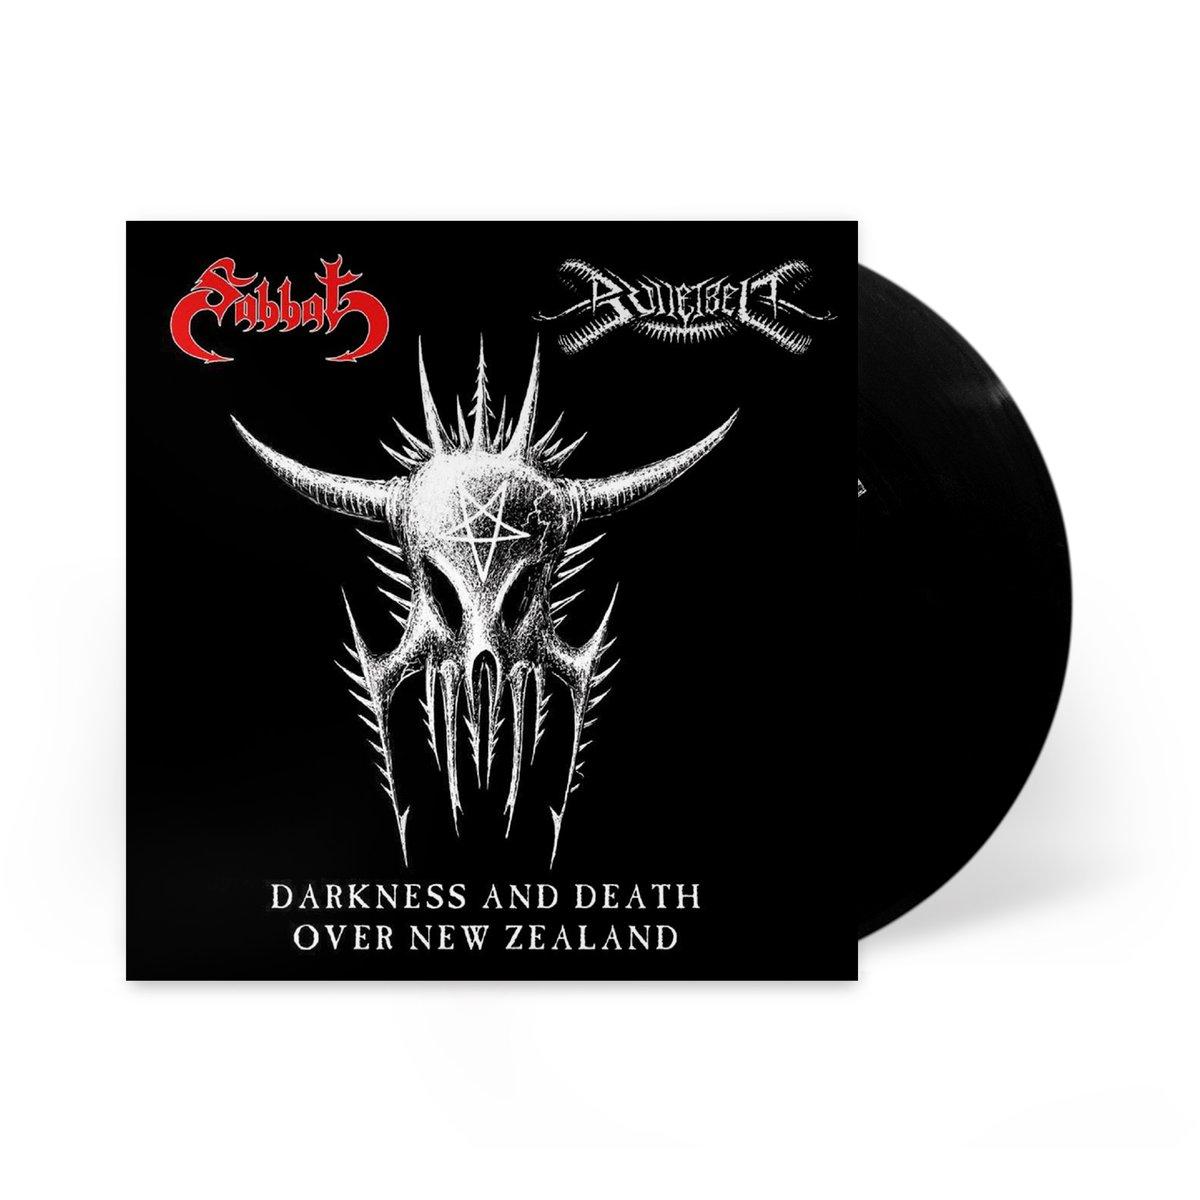 Image of Bulletbelt/Sabbat Split 7 inch LP